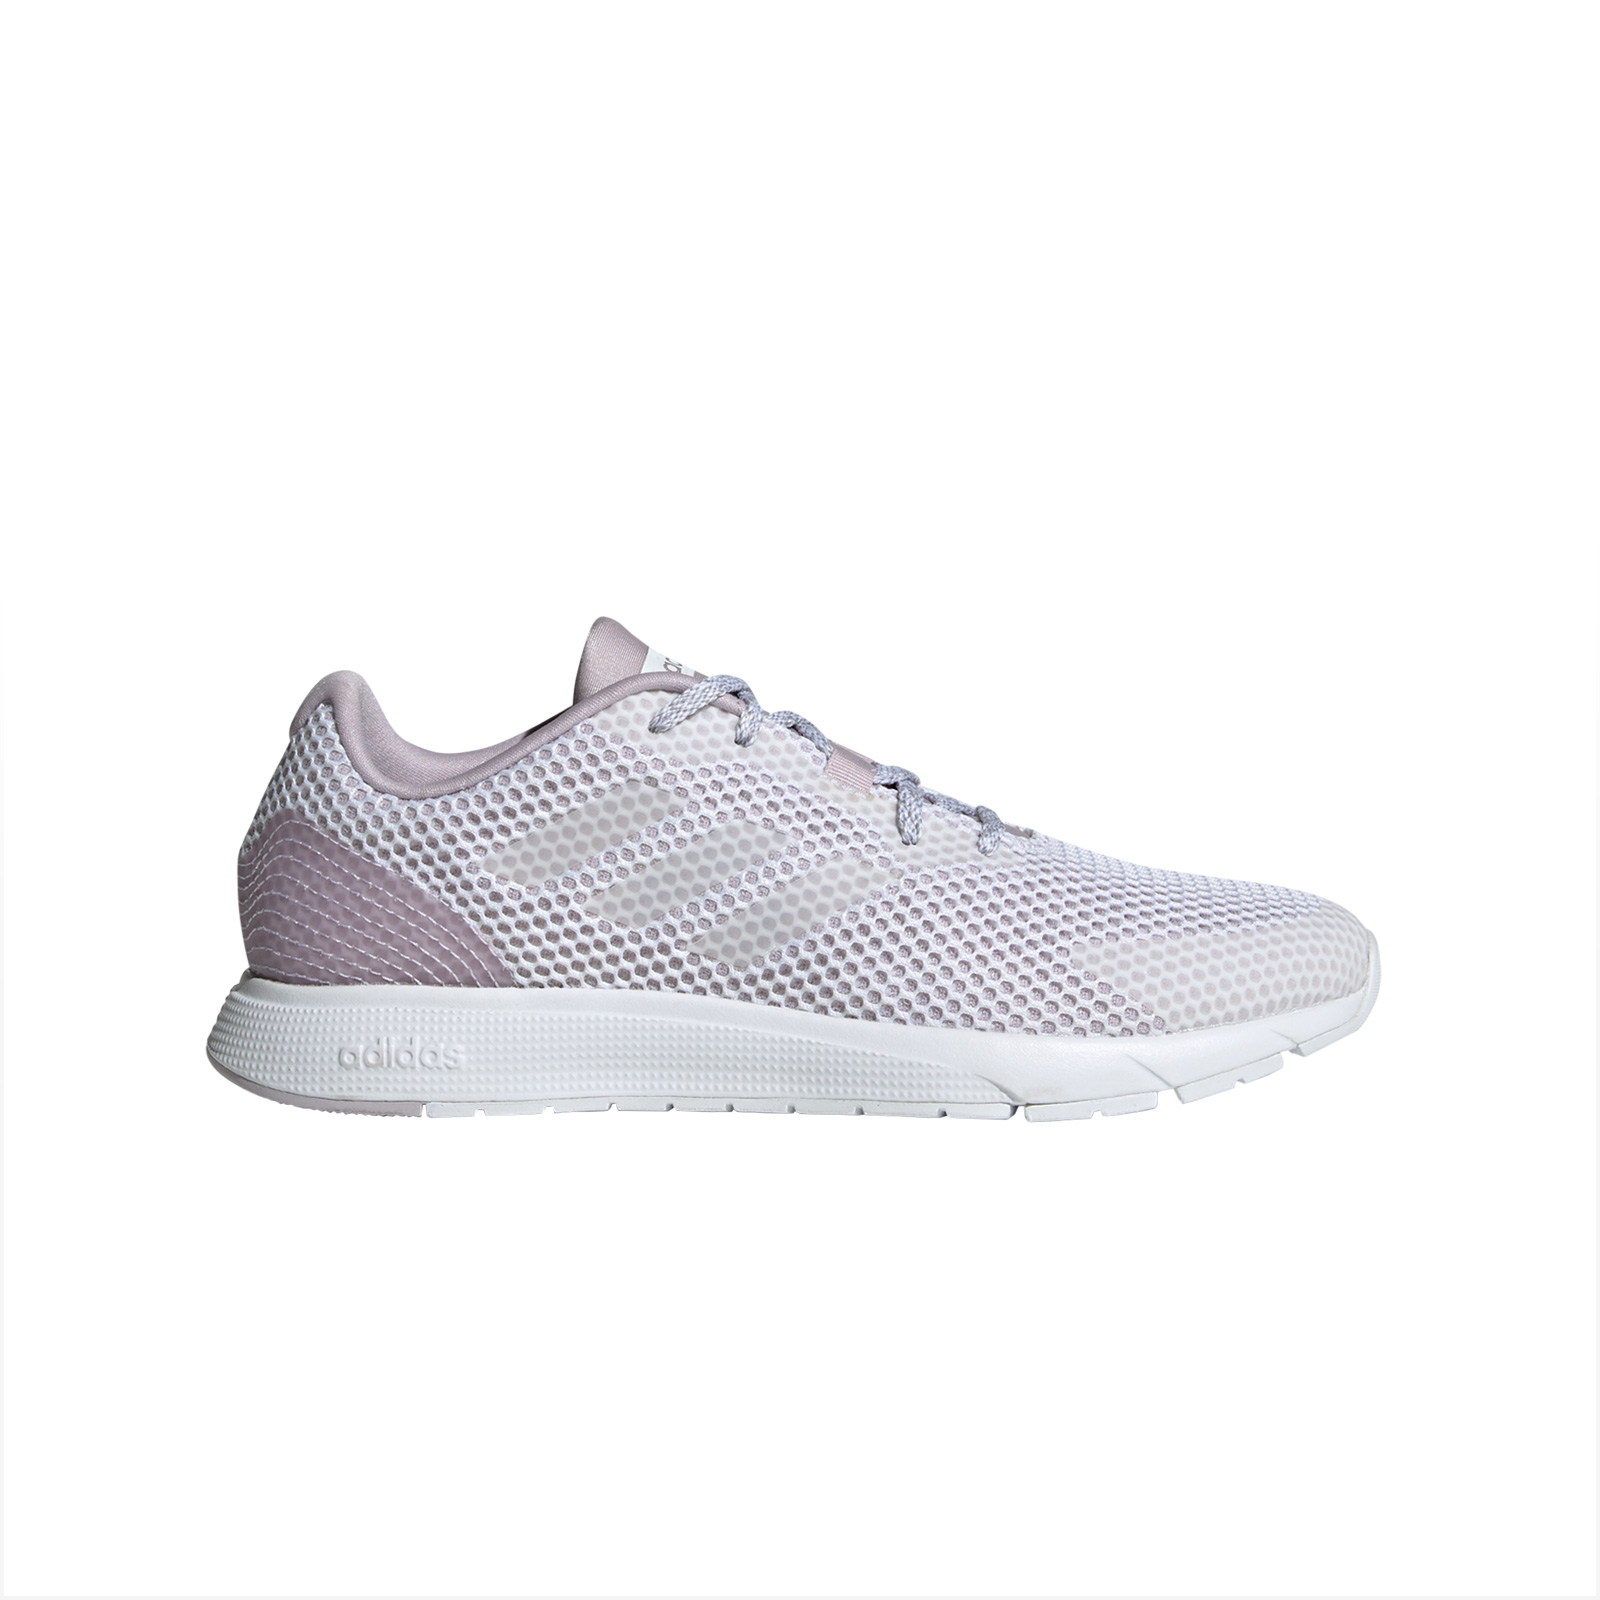 adidas - SOORAJ - FTWWHT/FTWWHT/MAUVE